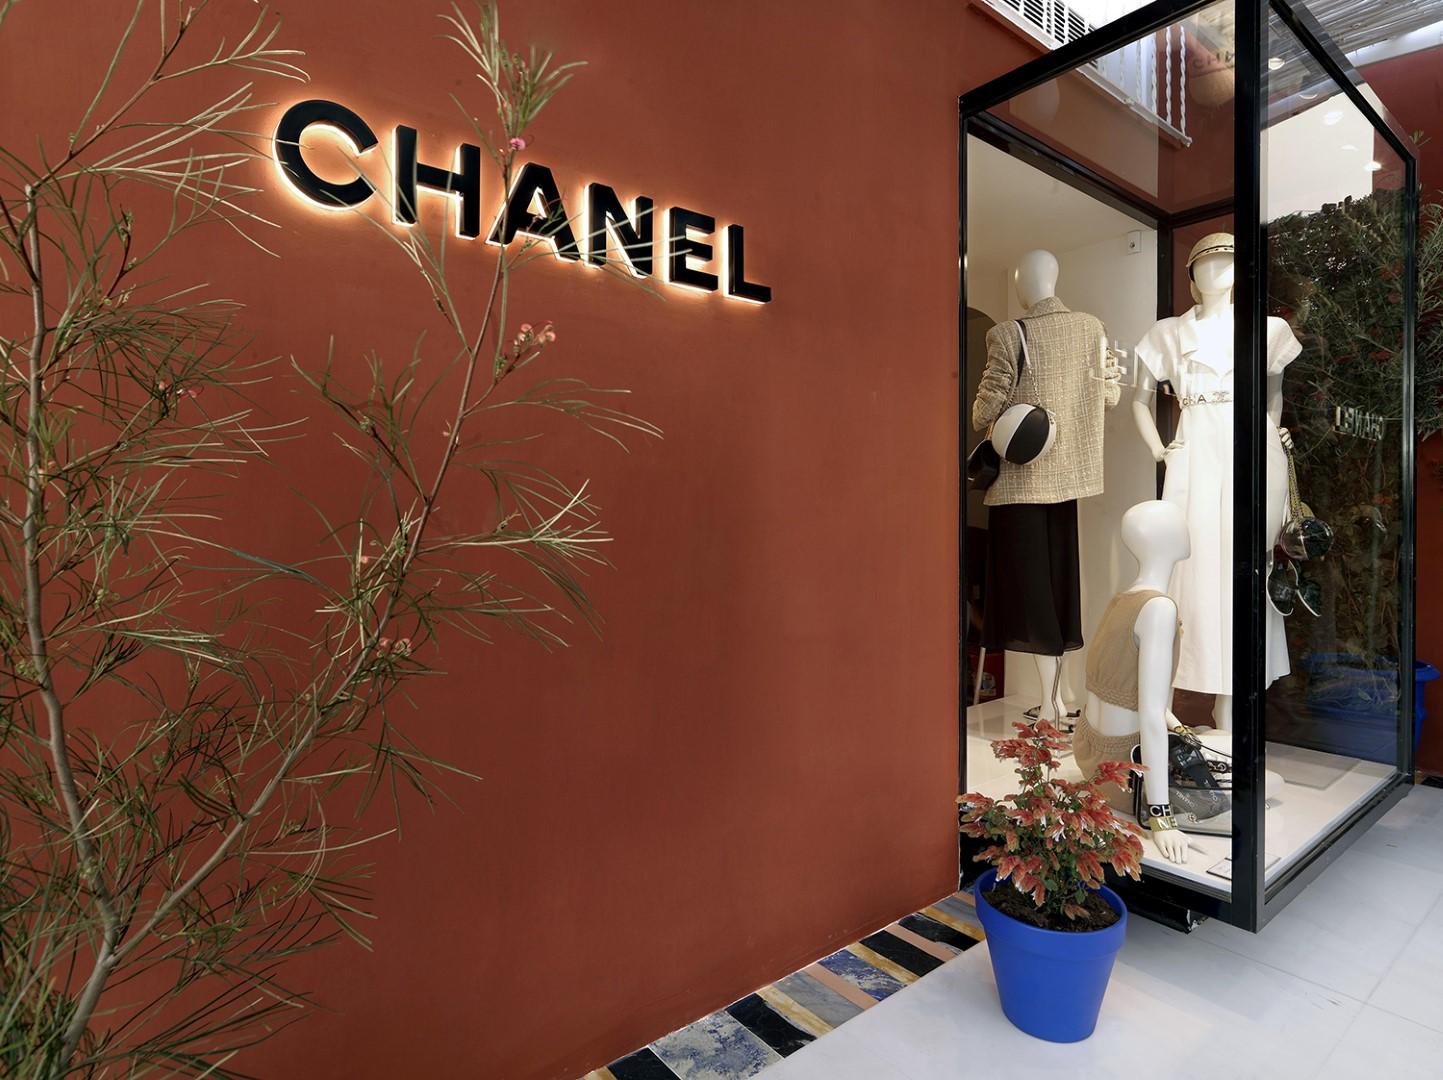 Chanel Capri pop up